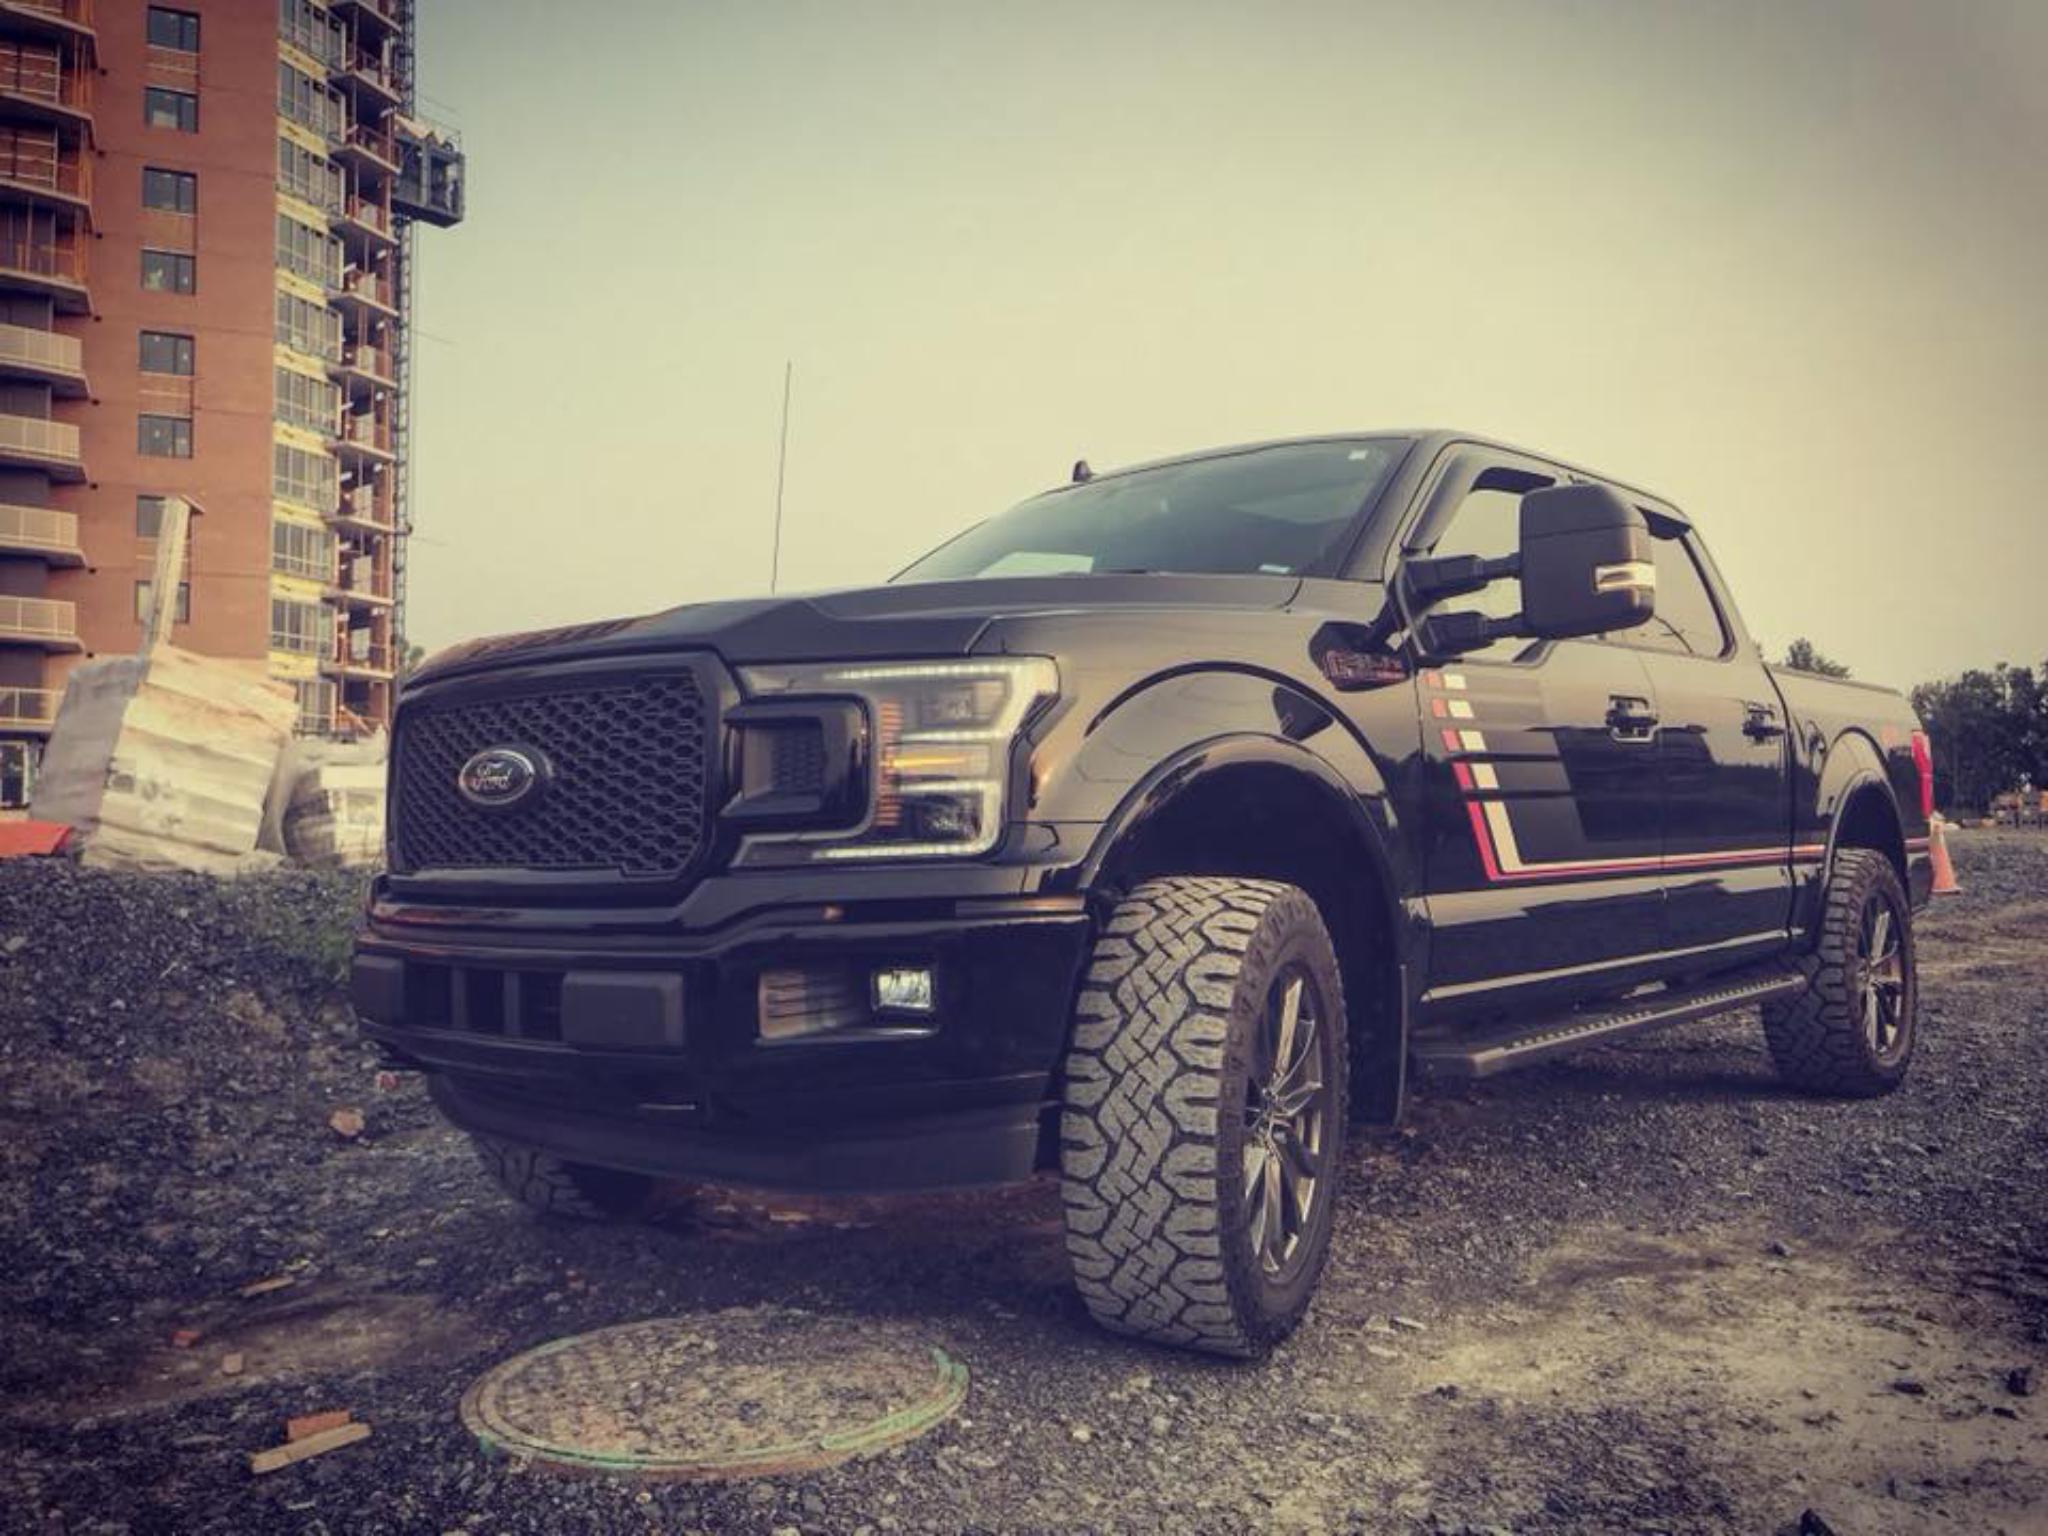 Pin By Zackyboy On Car And Trucks New Trucks Monster Trucks Trucks